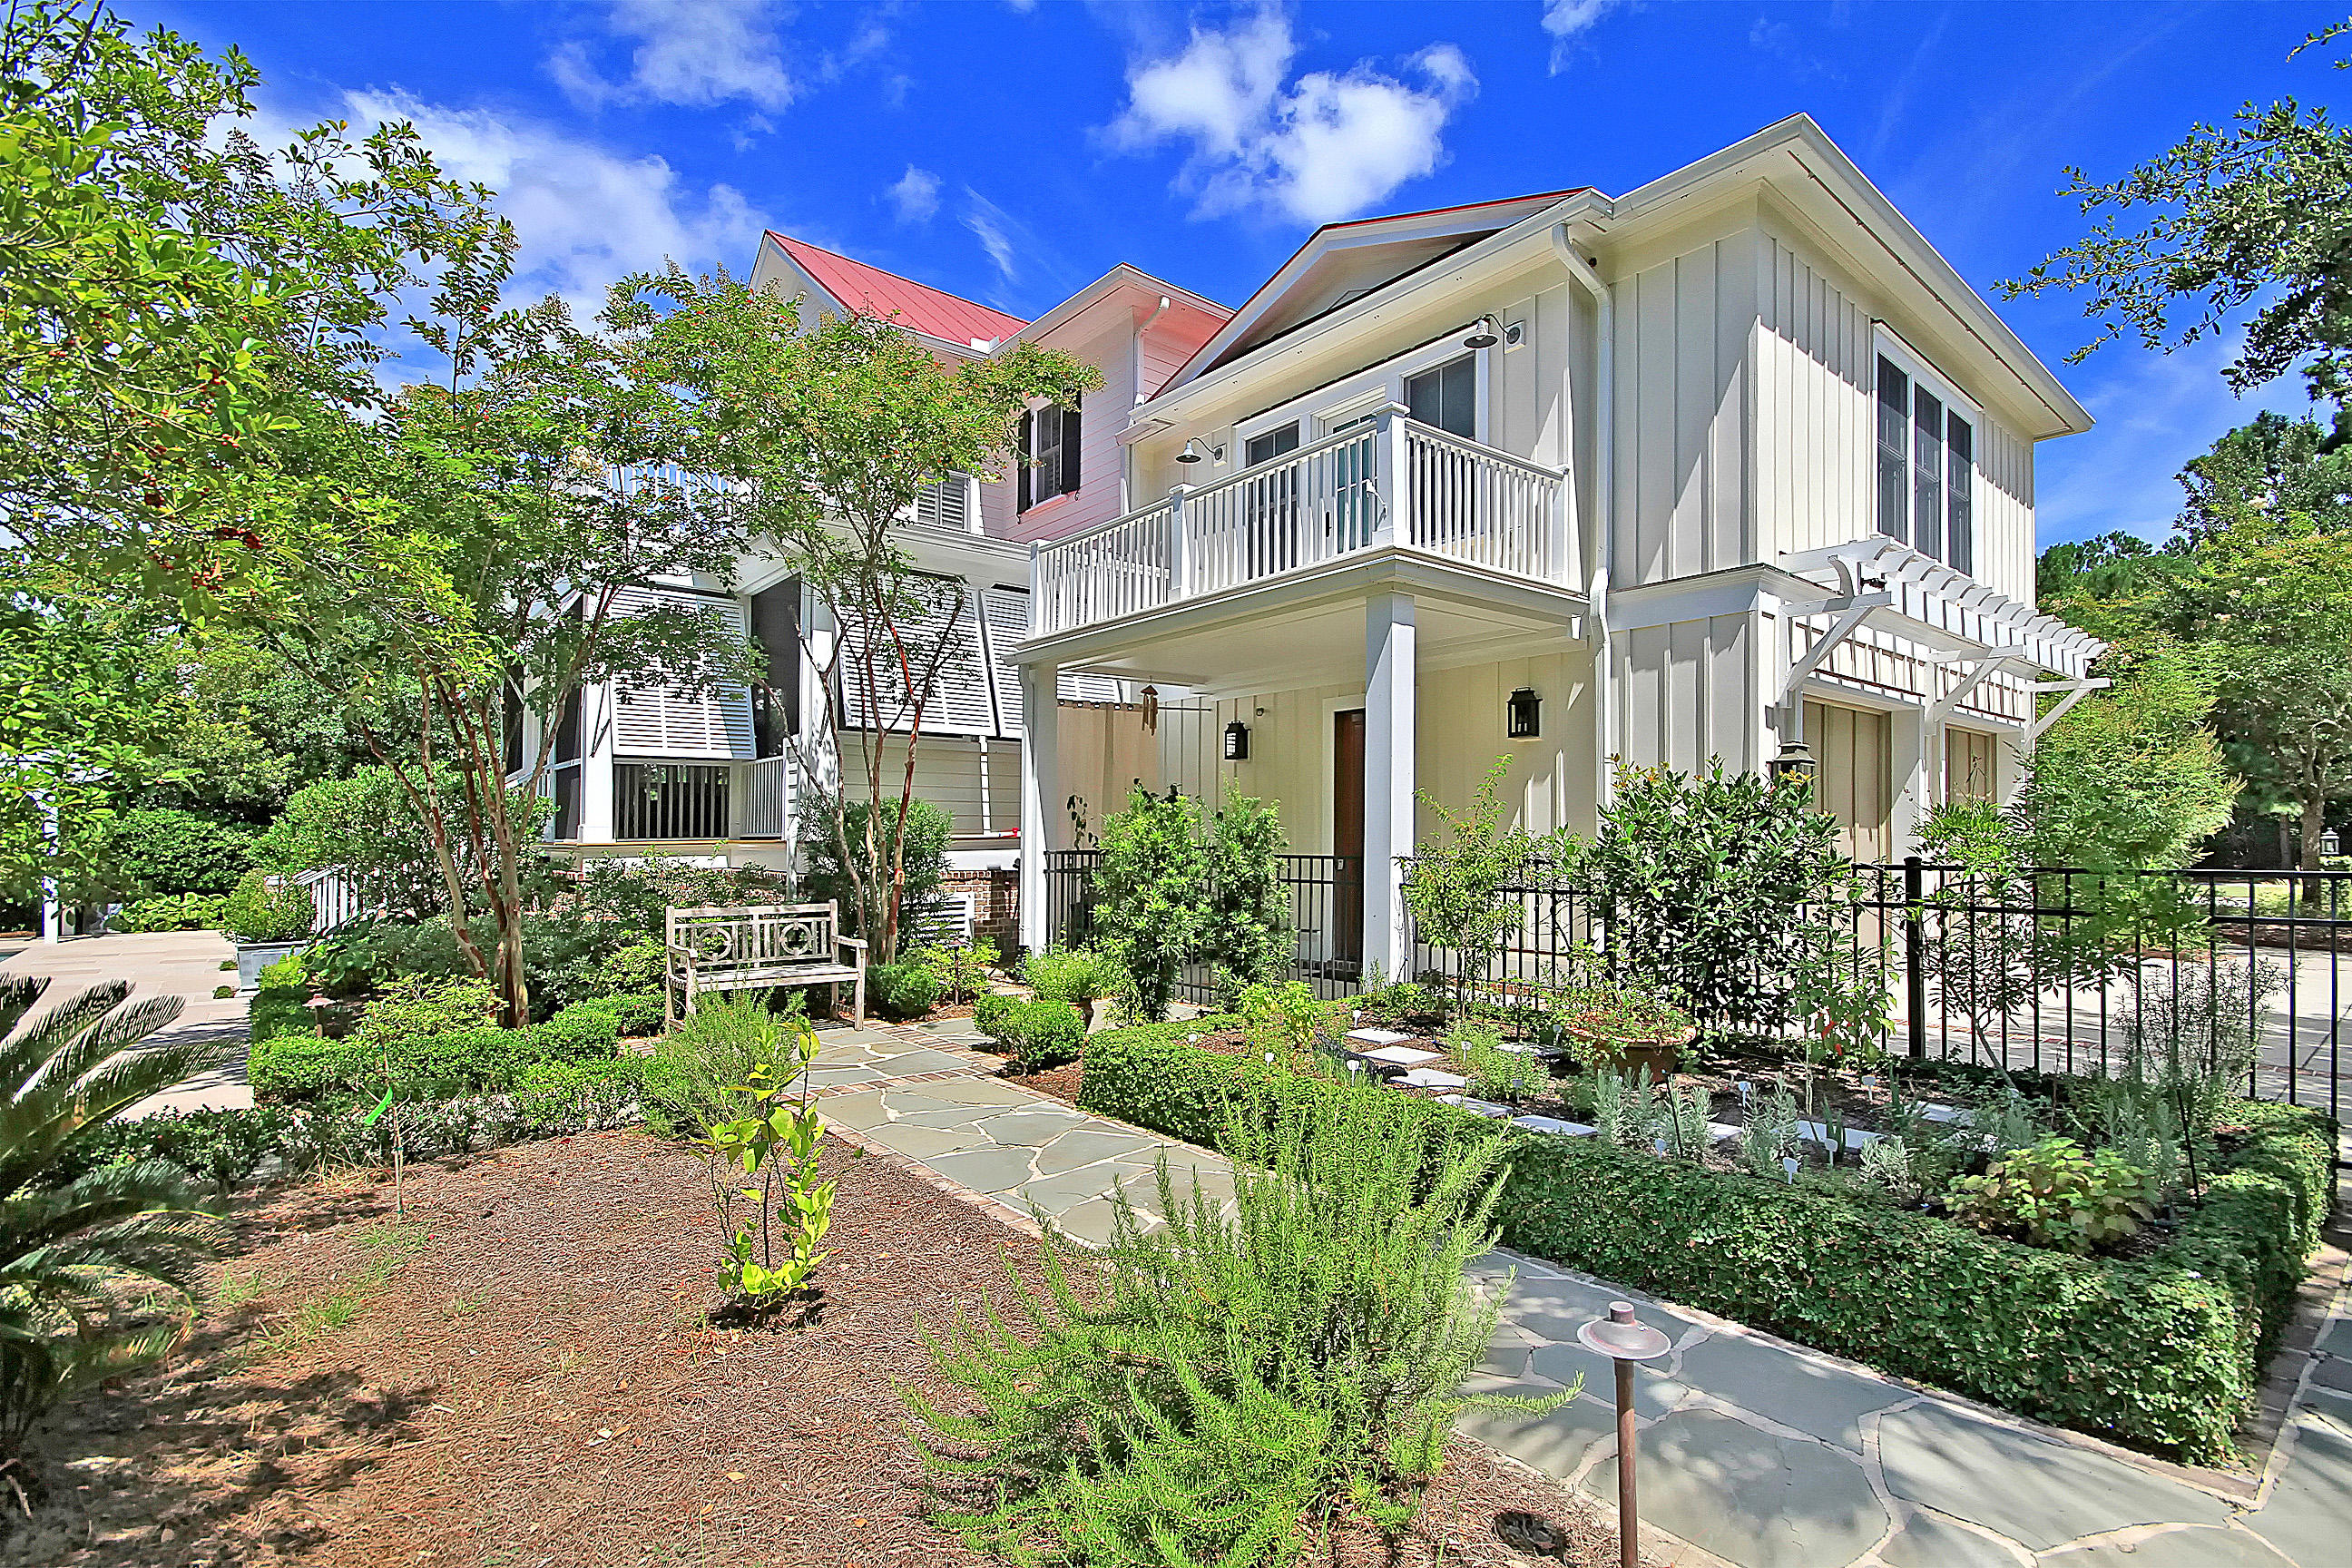 Daniel Island Homes For Sale - 520 Island Park, Daniel Island, SC - 50